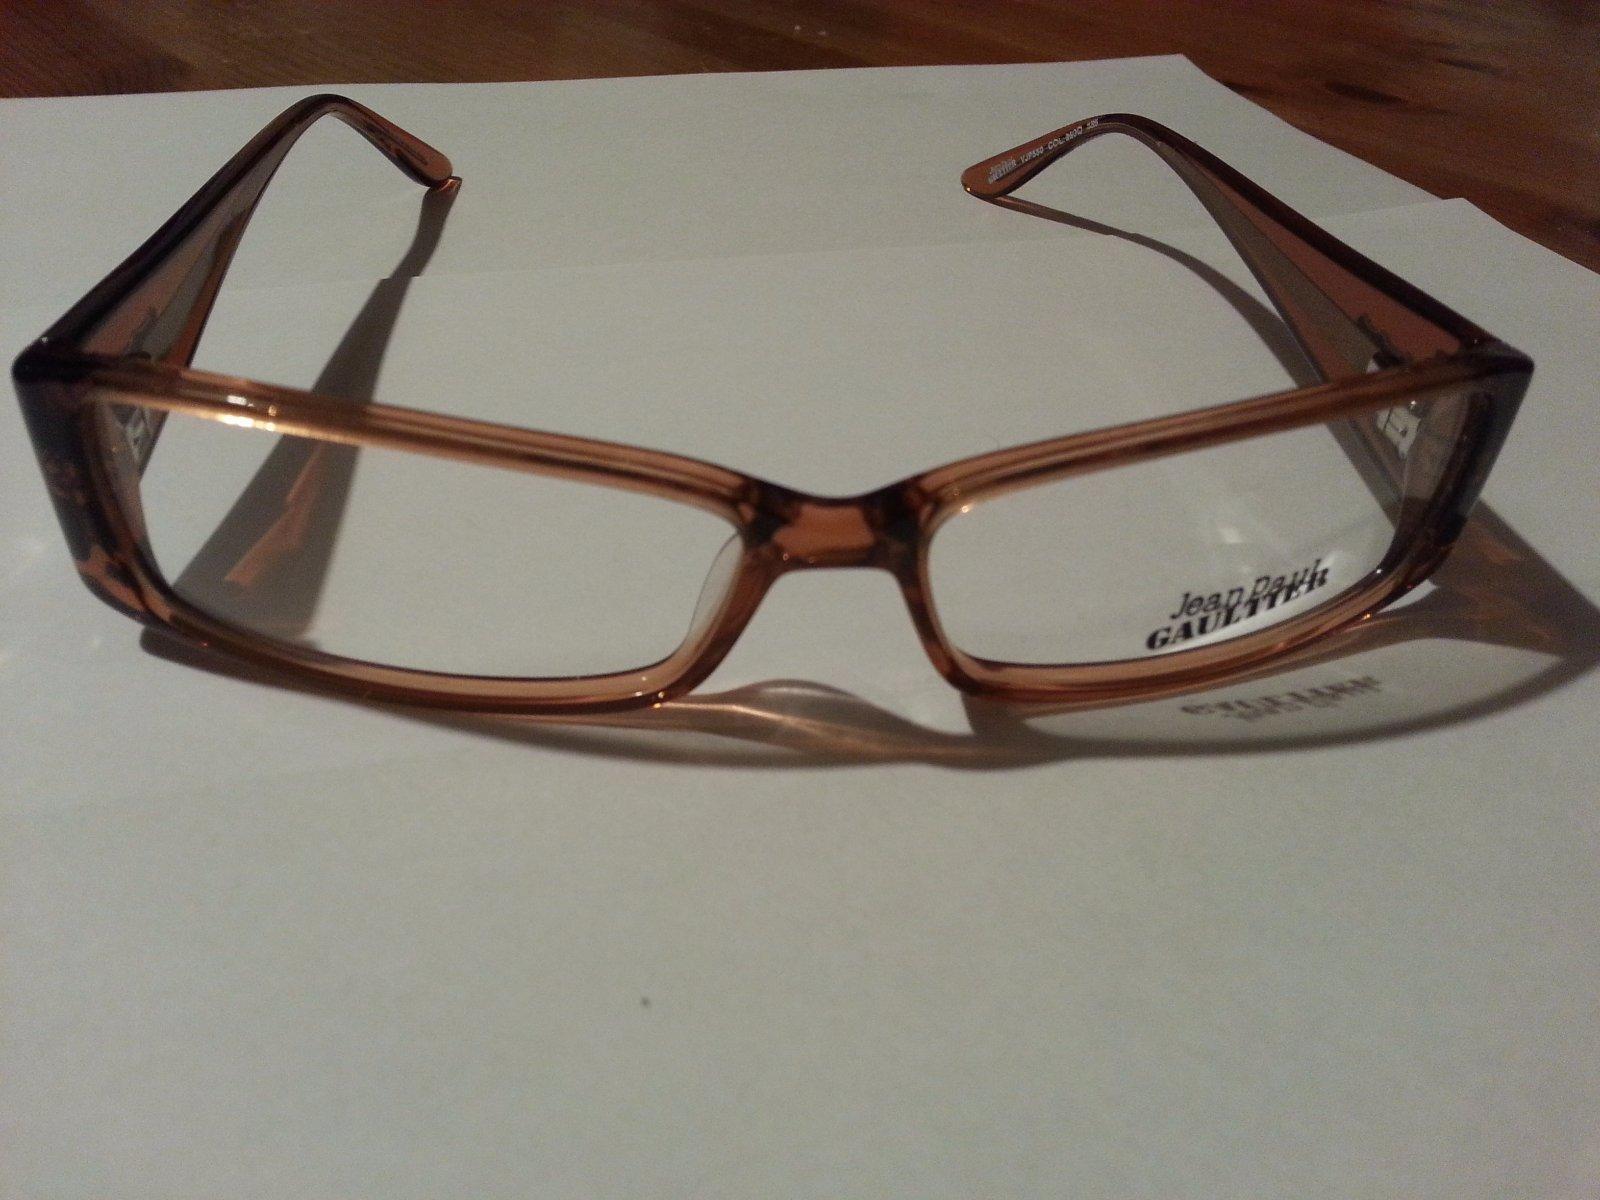 Rám na okuliare jean paul gaultier 3c4ae703e9b